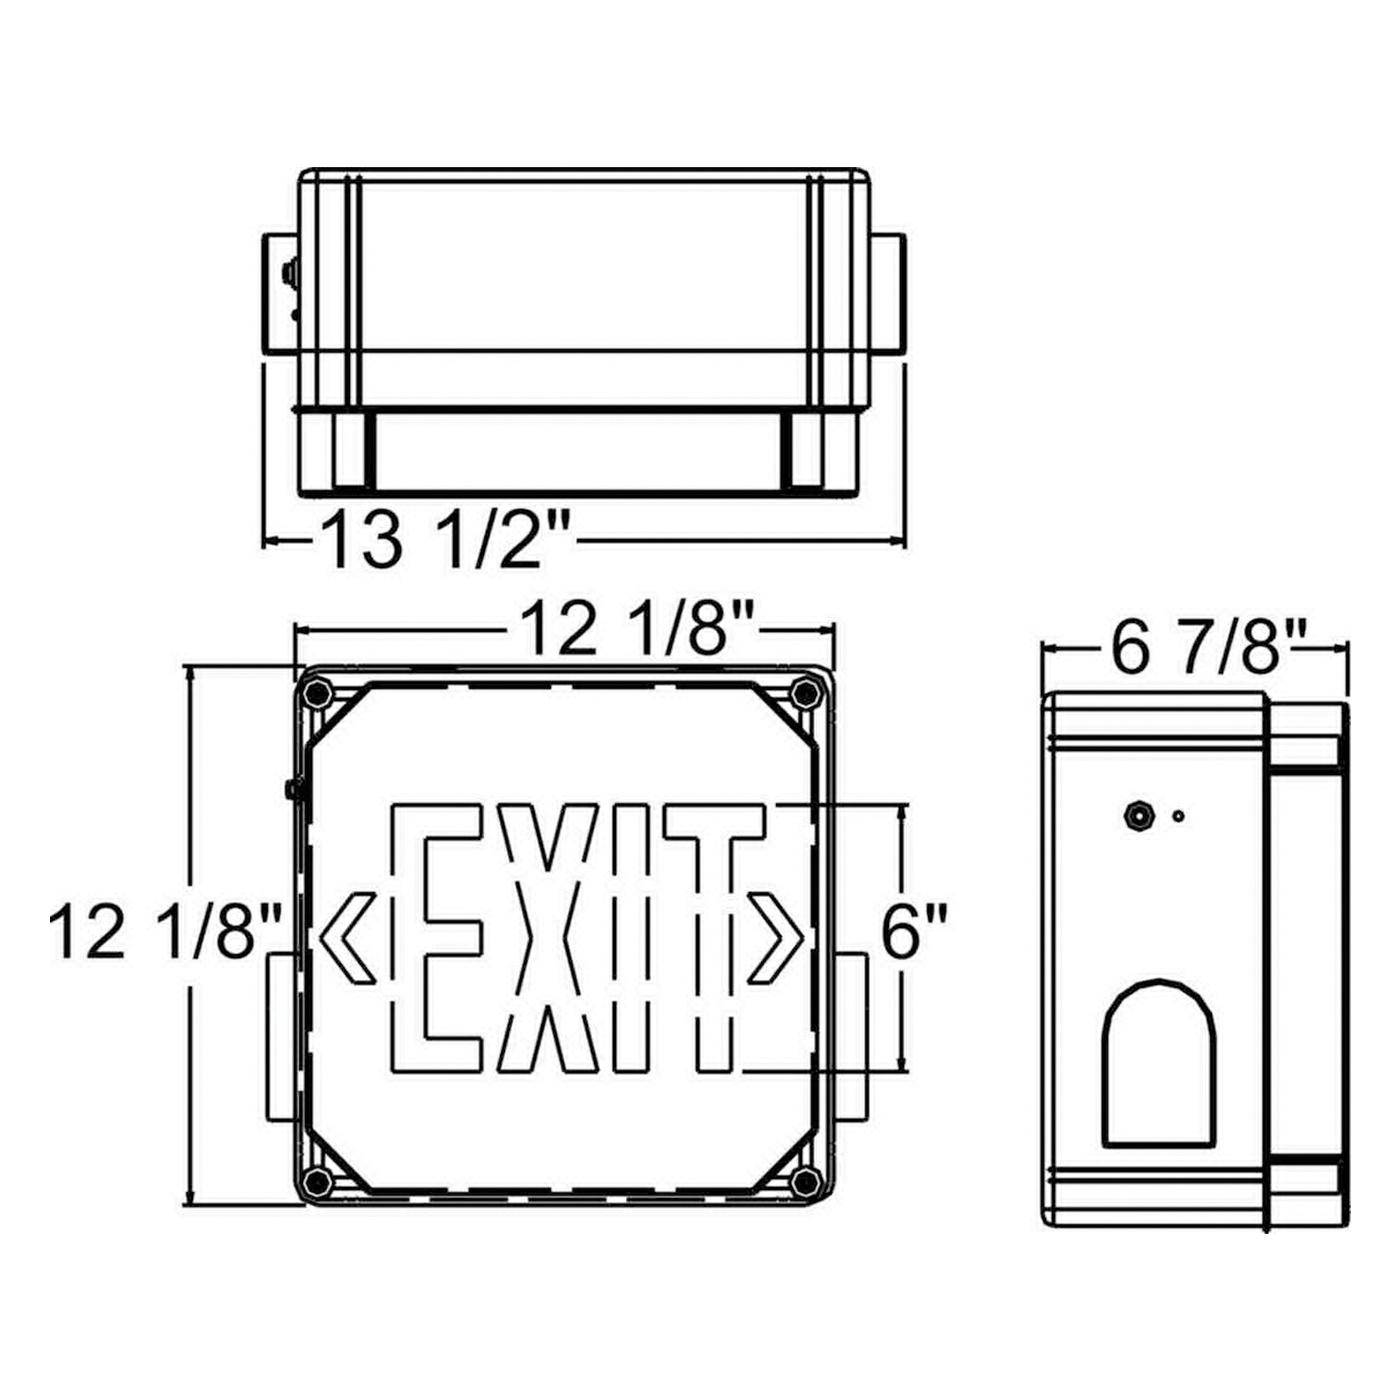 Orbit Industries ESLN4-G-EB Battery Back-Up LED Exit Sign